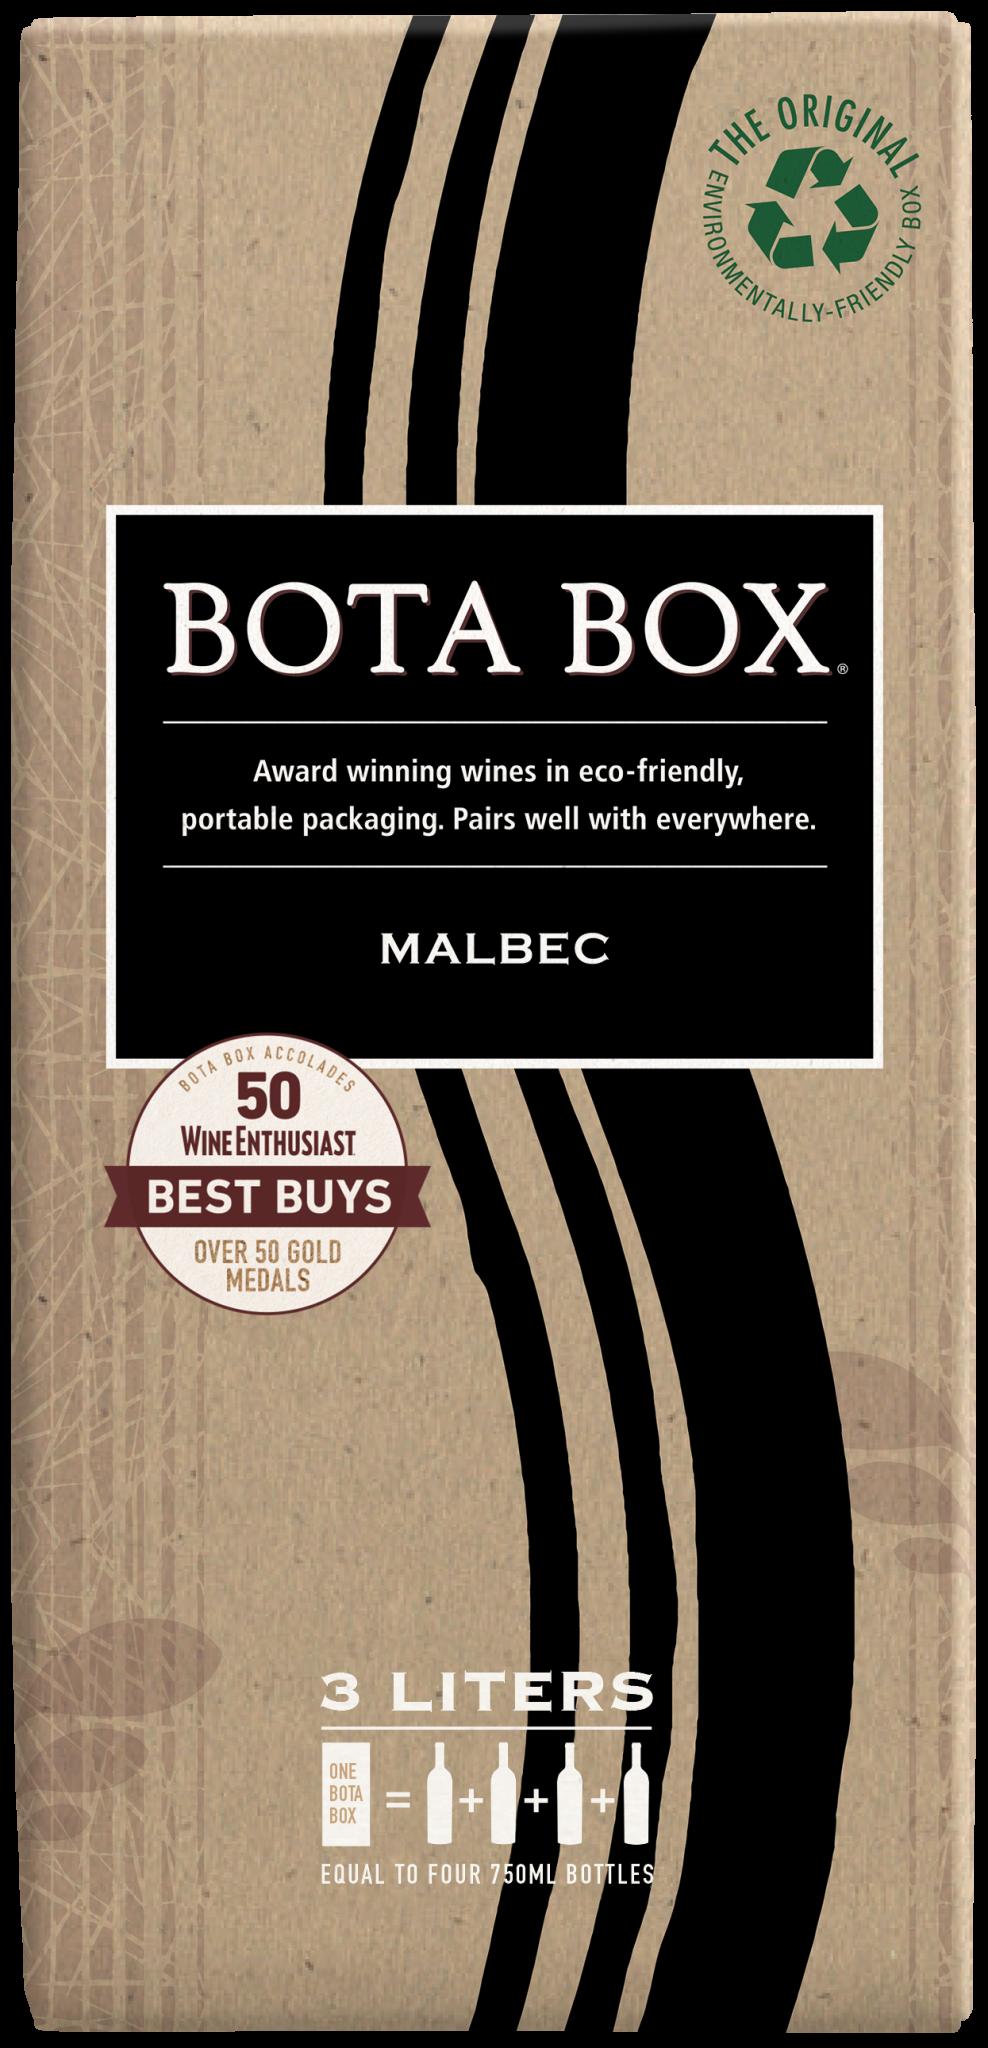 BOTA BOX MALBEC 3 LITER BOX